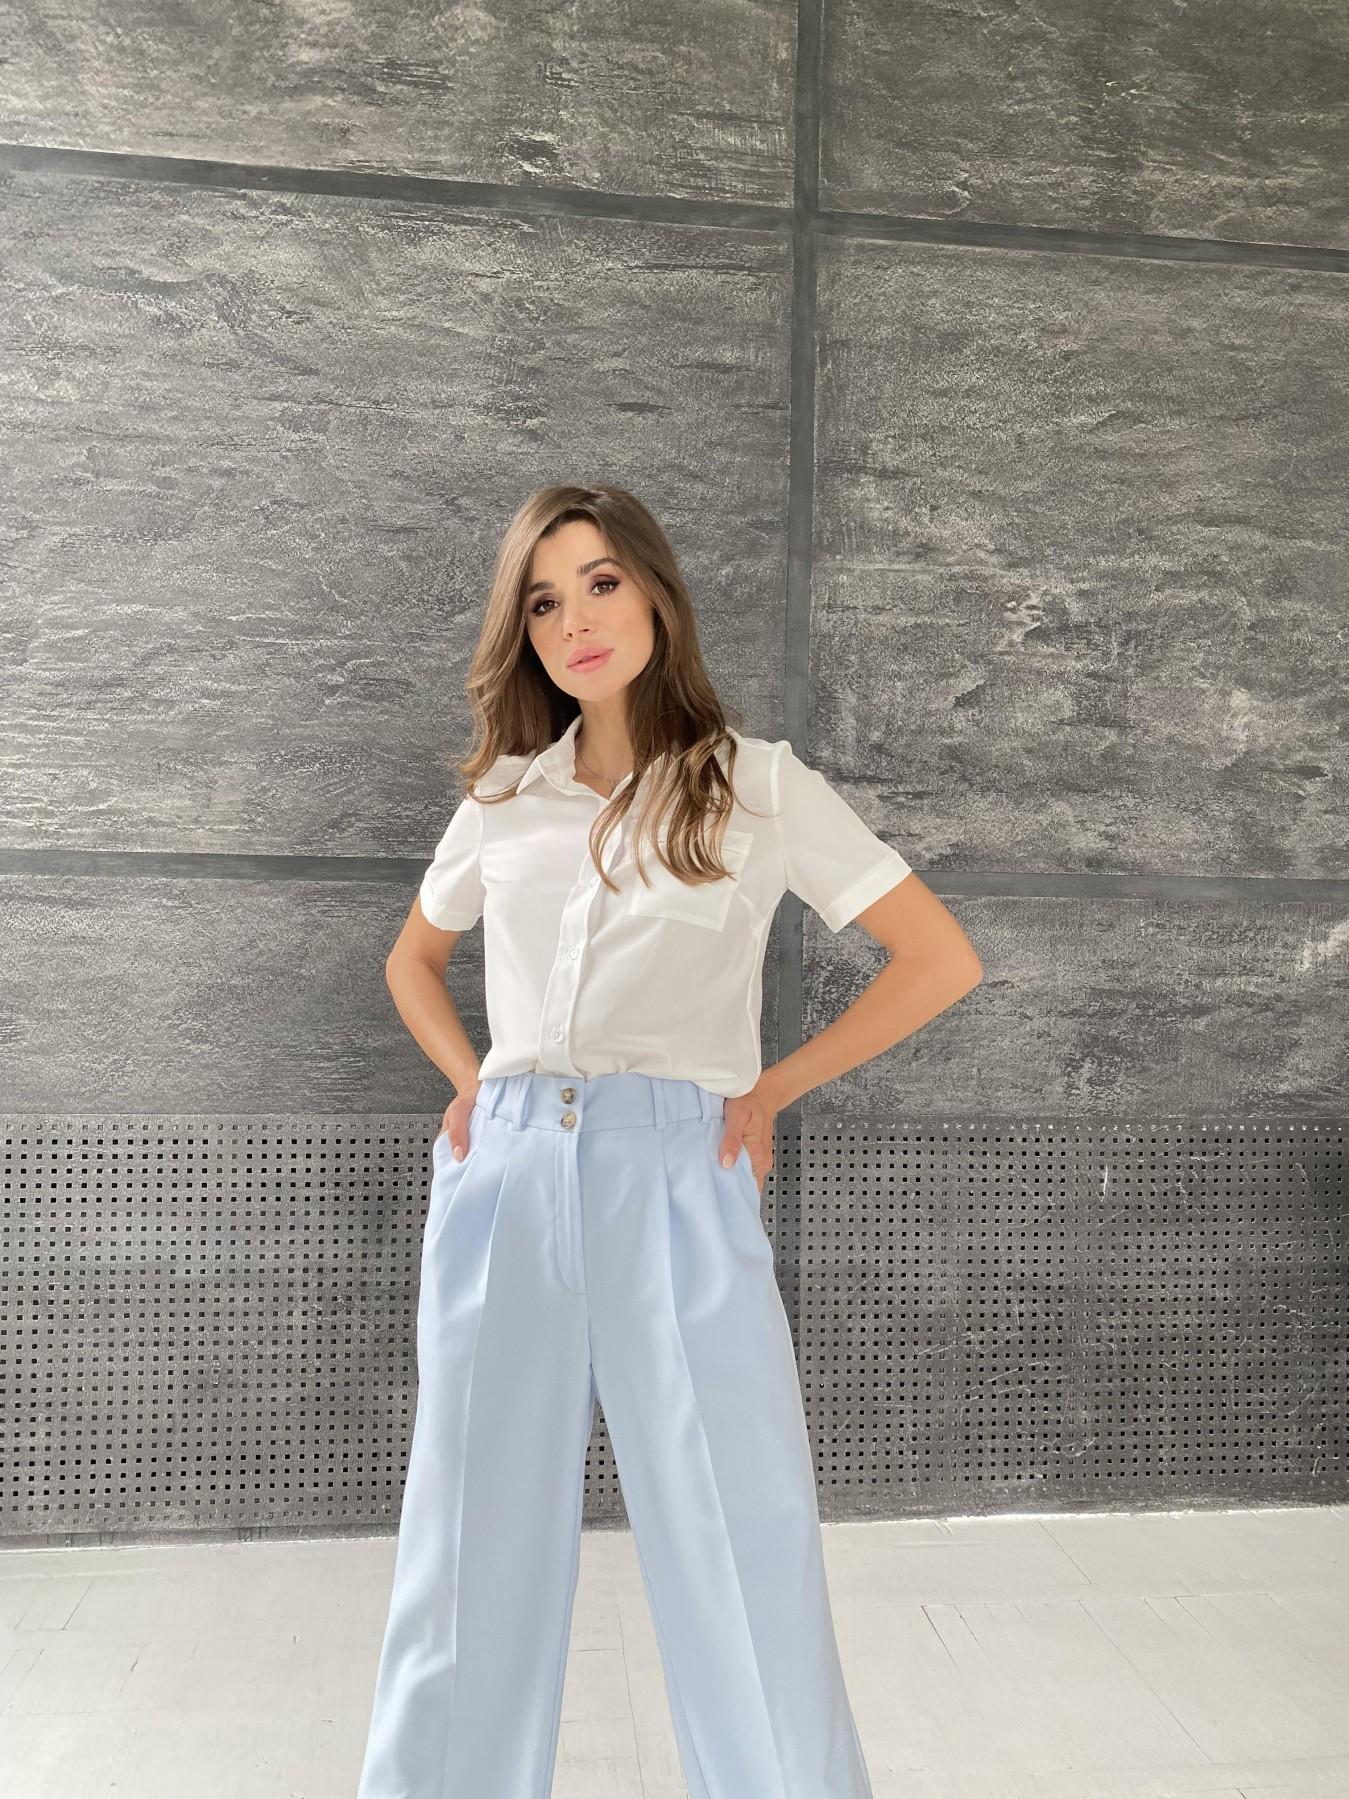 Дженна блуза  софт 11594 АРТ. 48274 Цвет: Белый - фото 4, интернет магазин tm-modus.ru